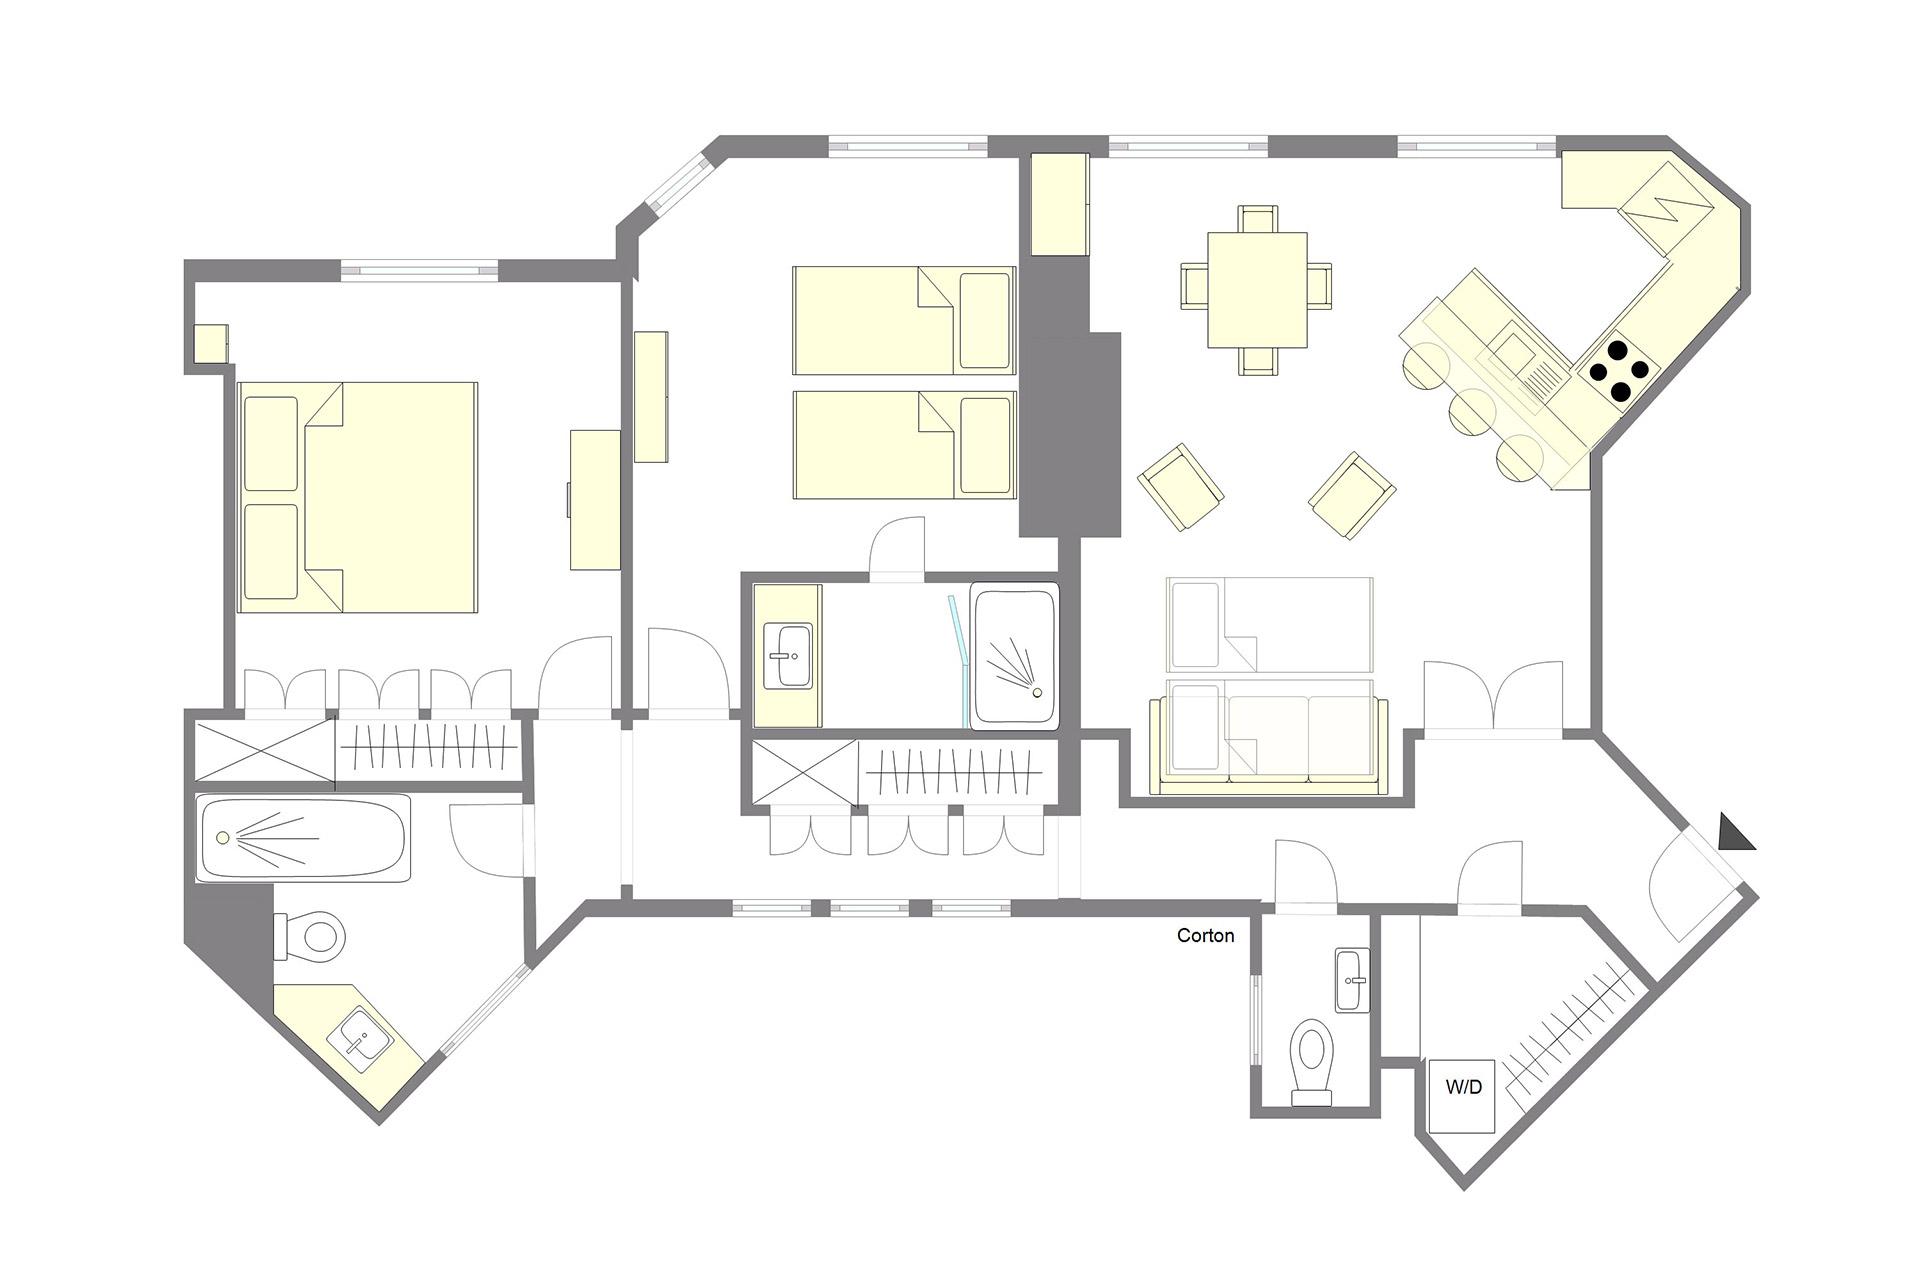 2 Bedroom St Germain Apartment Paris